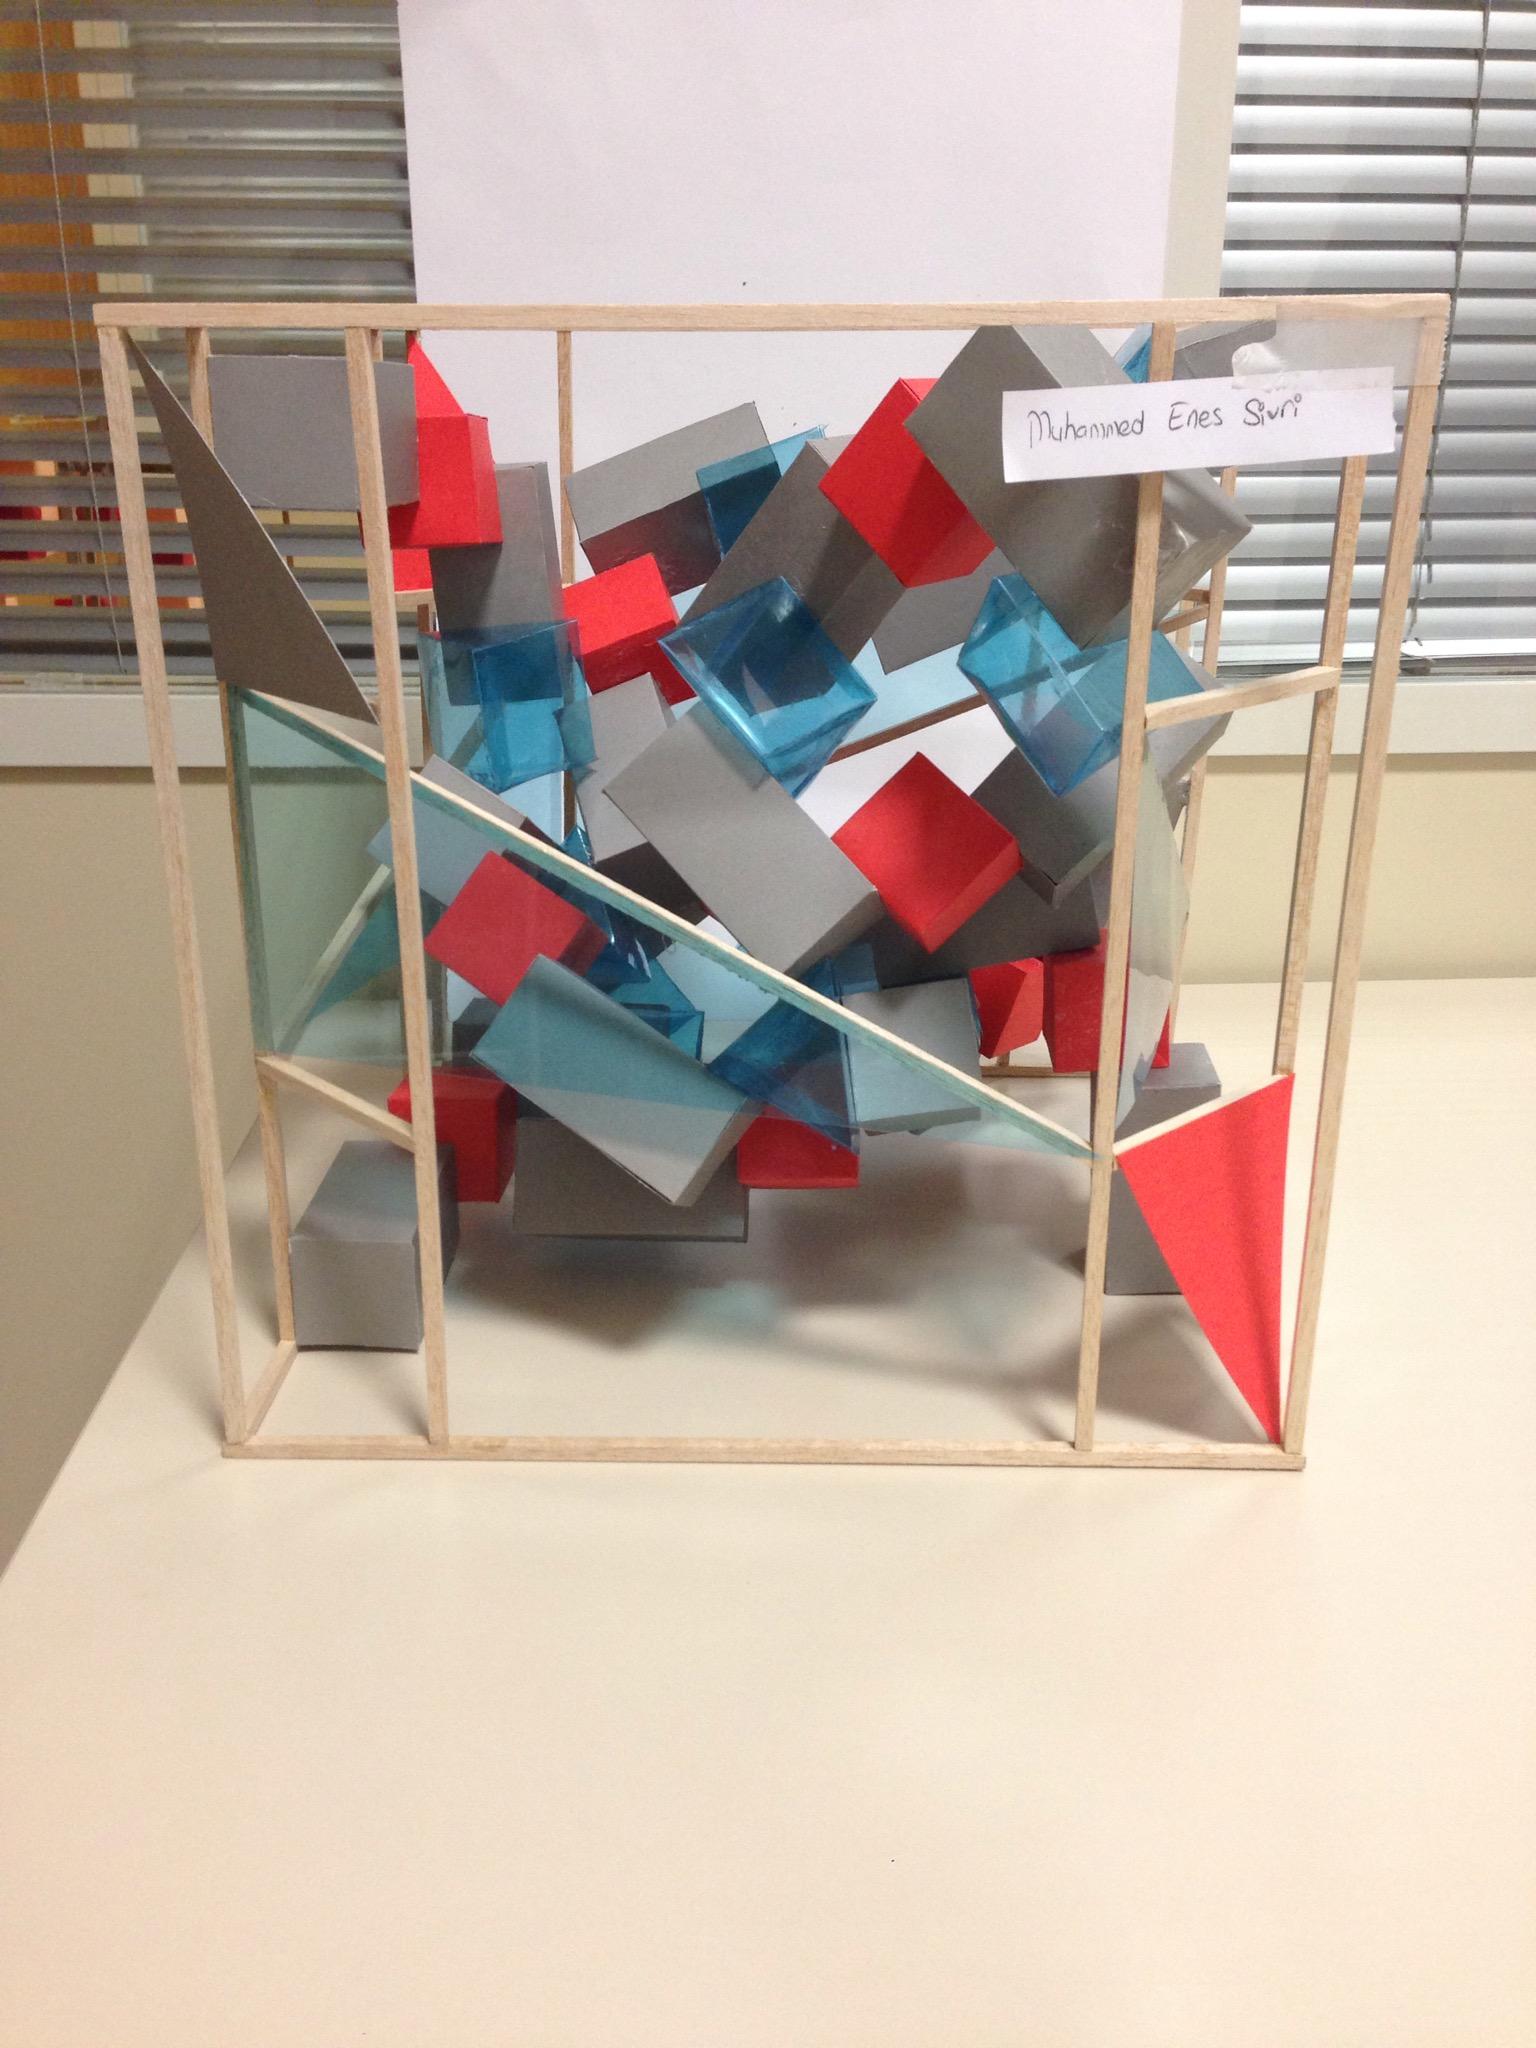 Visual Cube Exercise Basic Design Critics